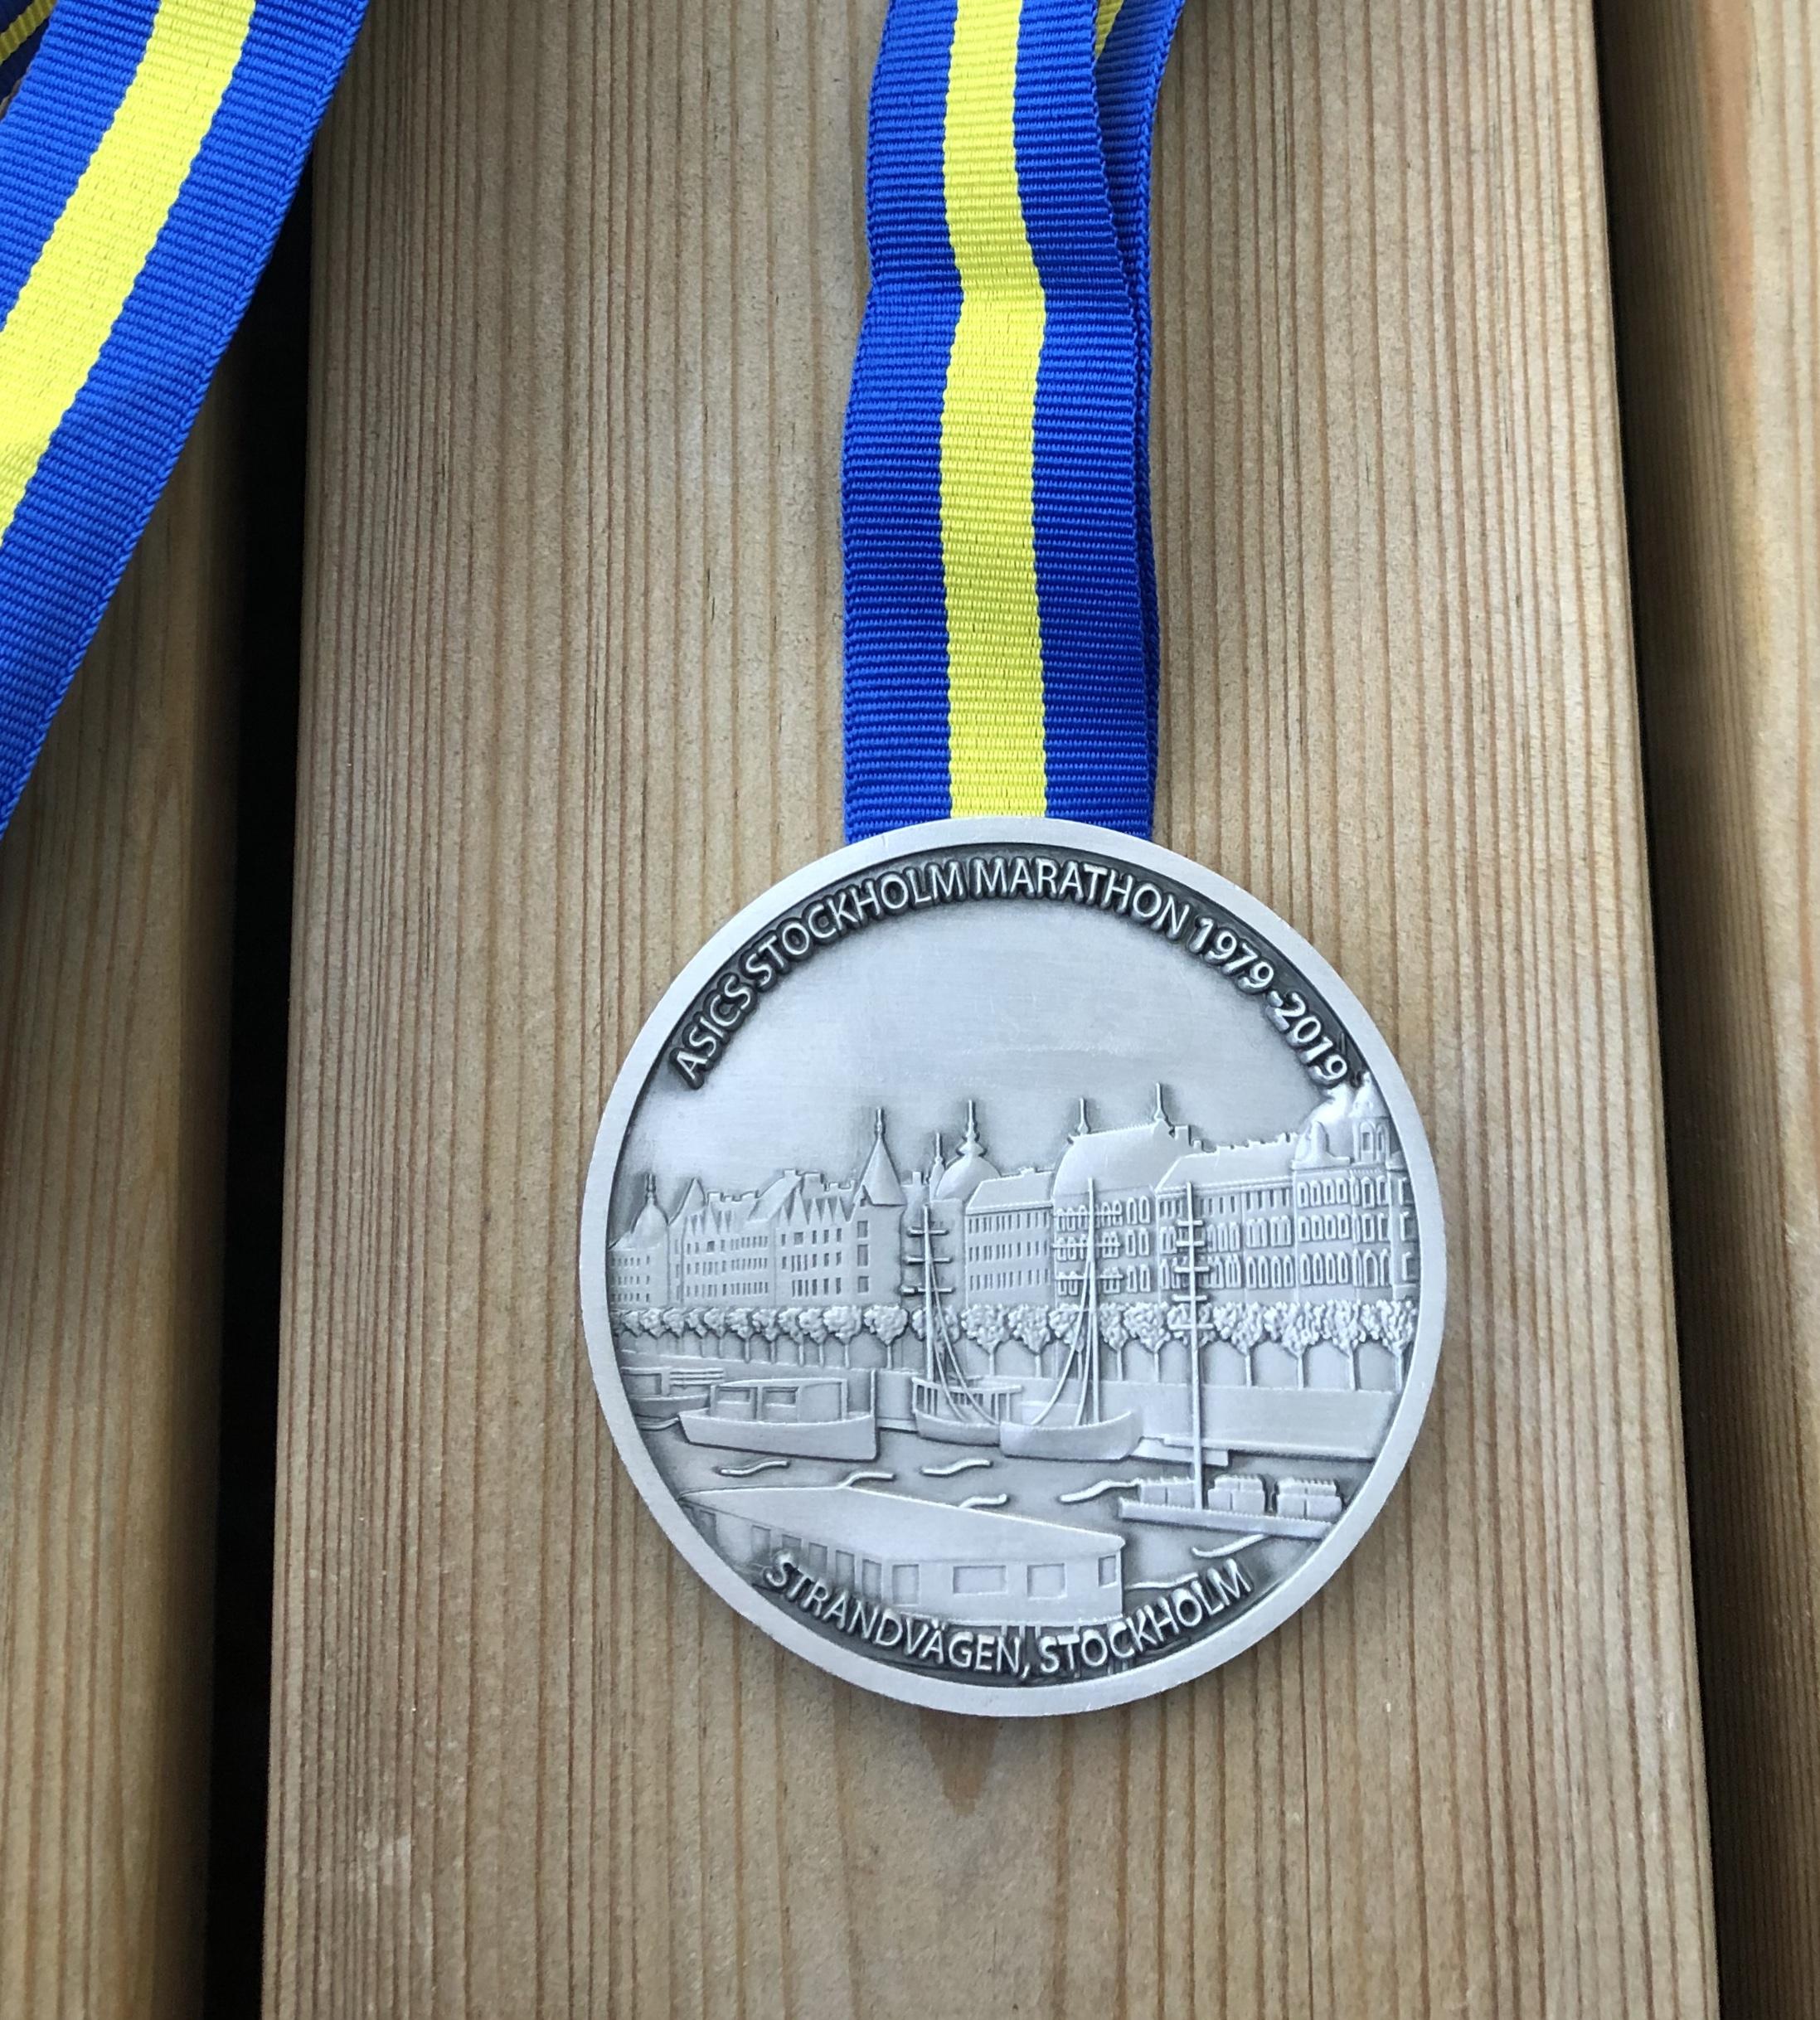 Asics Stockholm Marathon 2019 mitali